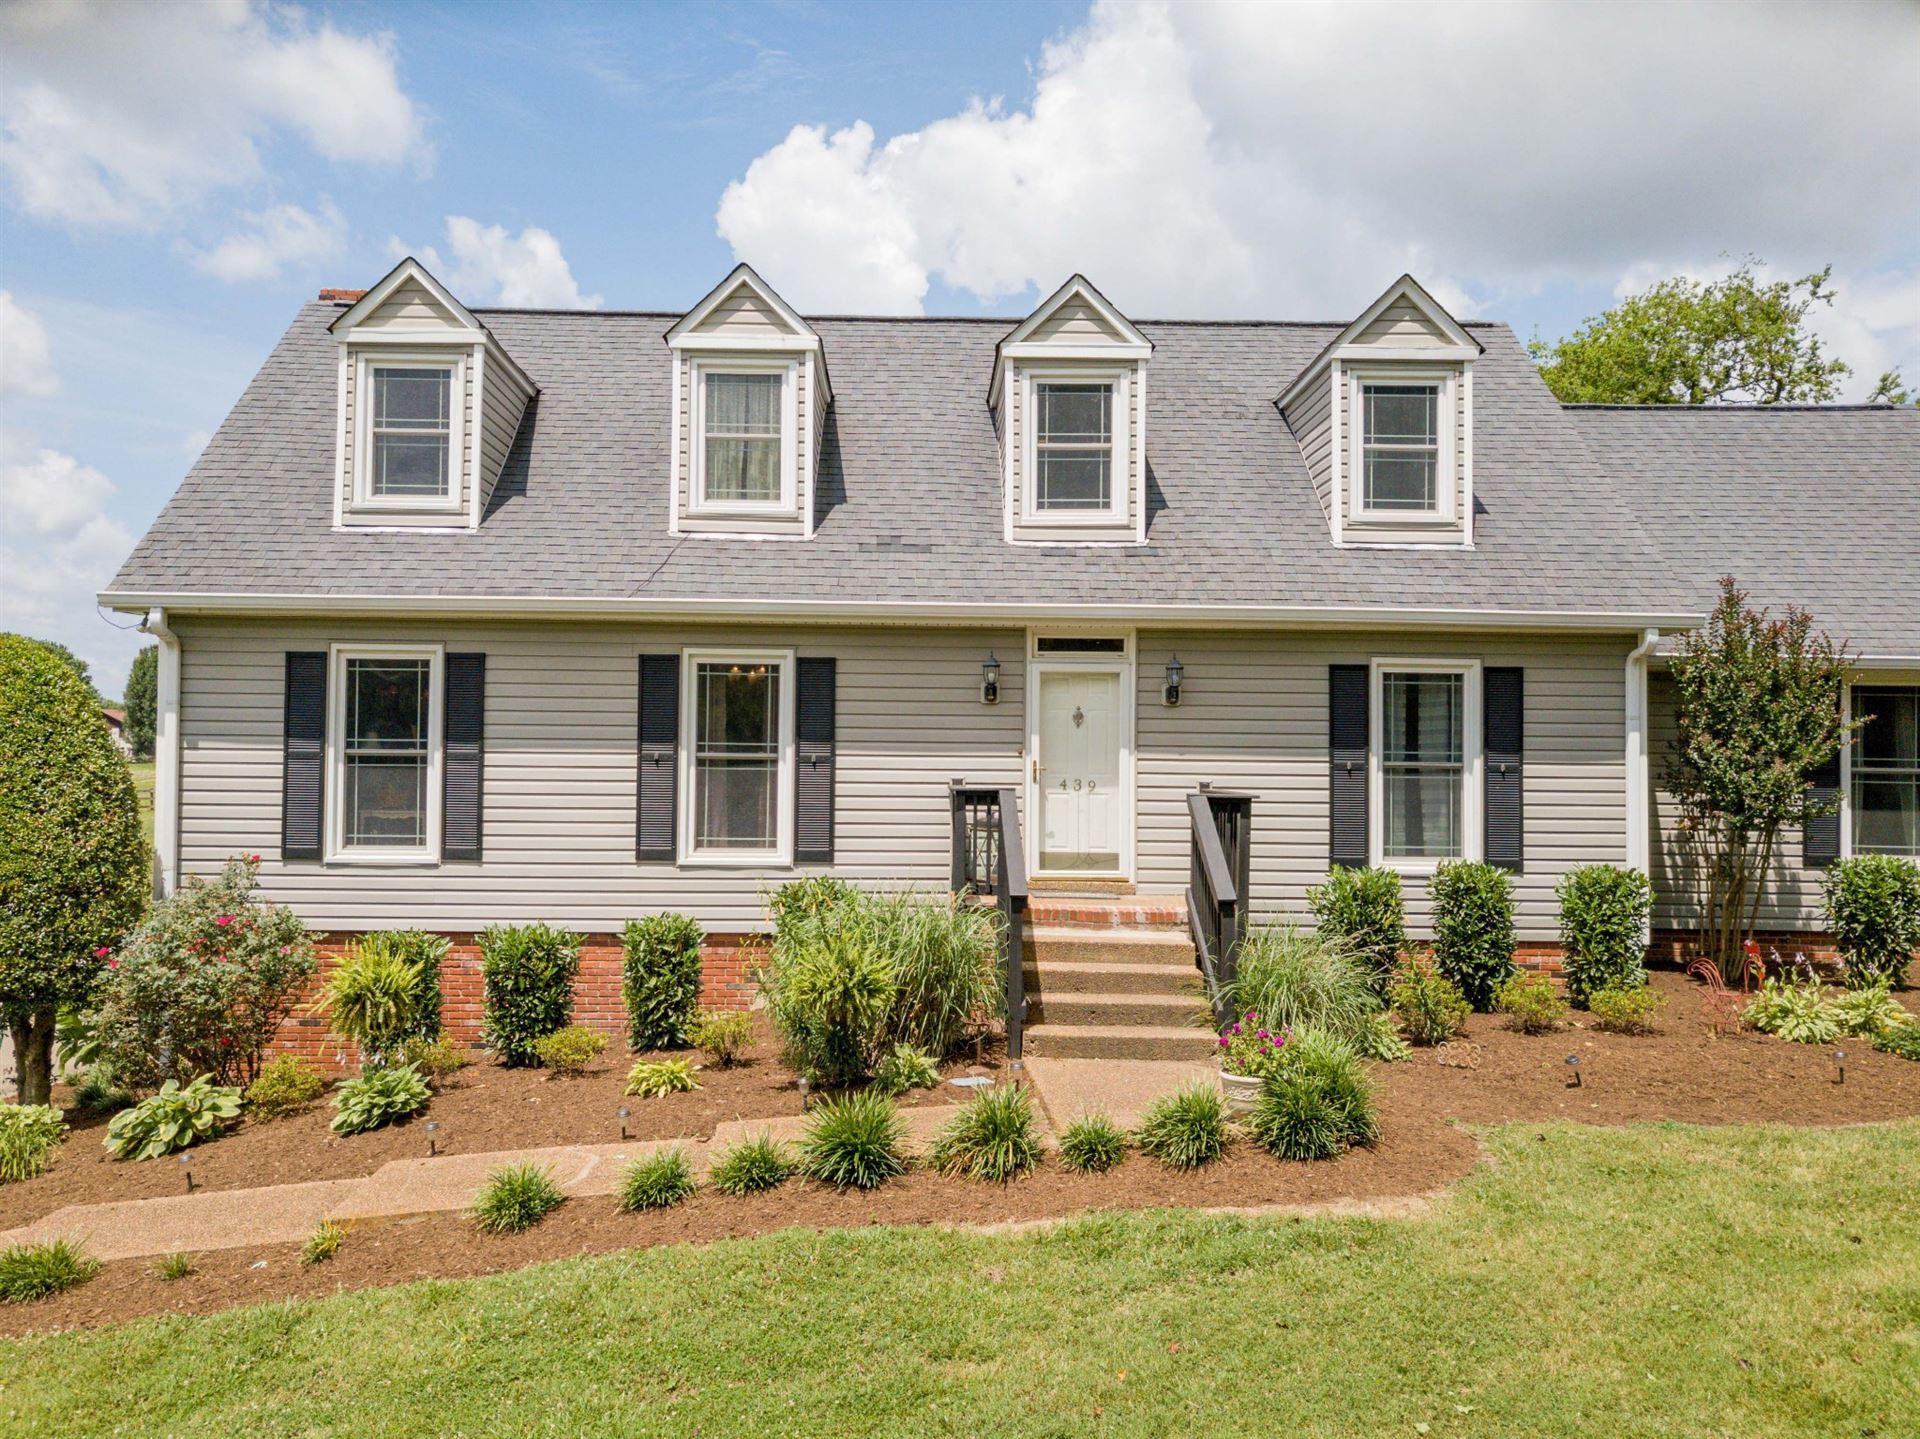 439 Jones Lane, Hendersonville, TN 37075 - MLS#: 2158165